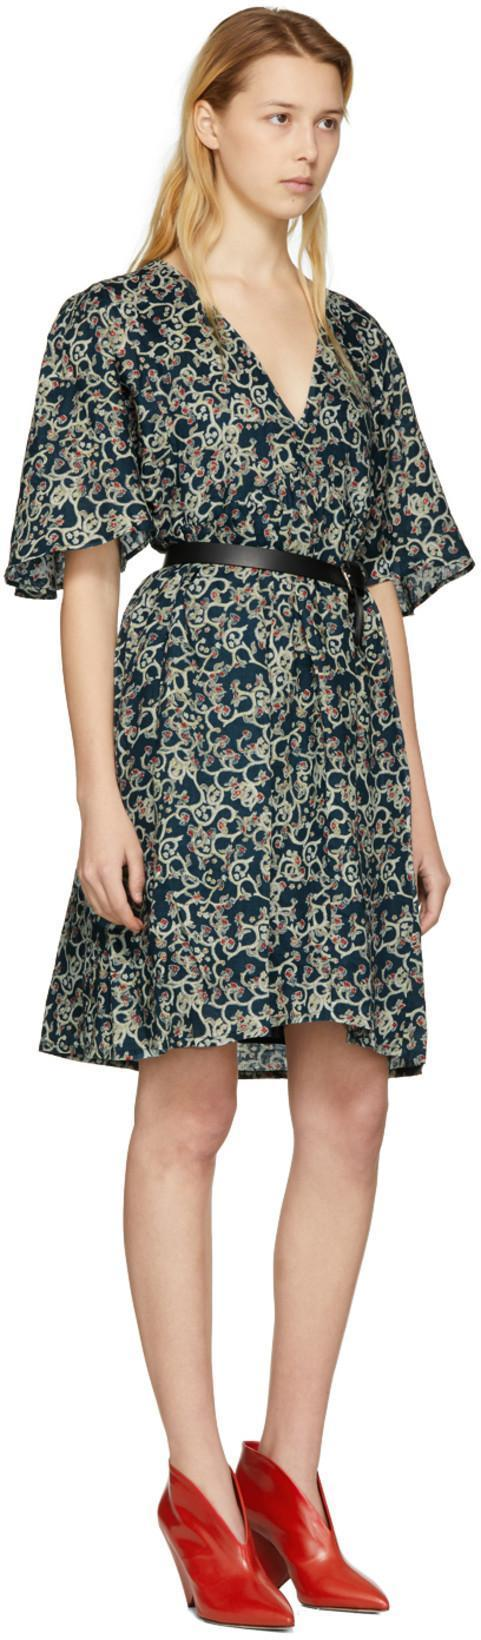 3f85bfe9ffc ETOILE ISABEL MARANT Isabel Marant Etoile Multicolor Talita Dress in Faded  Black